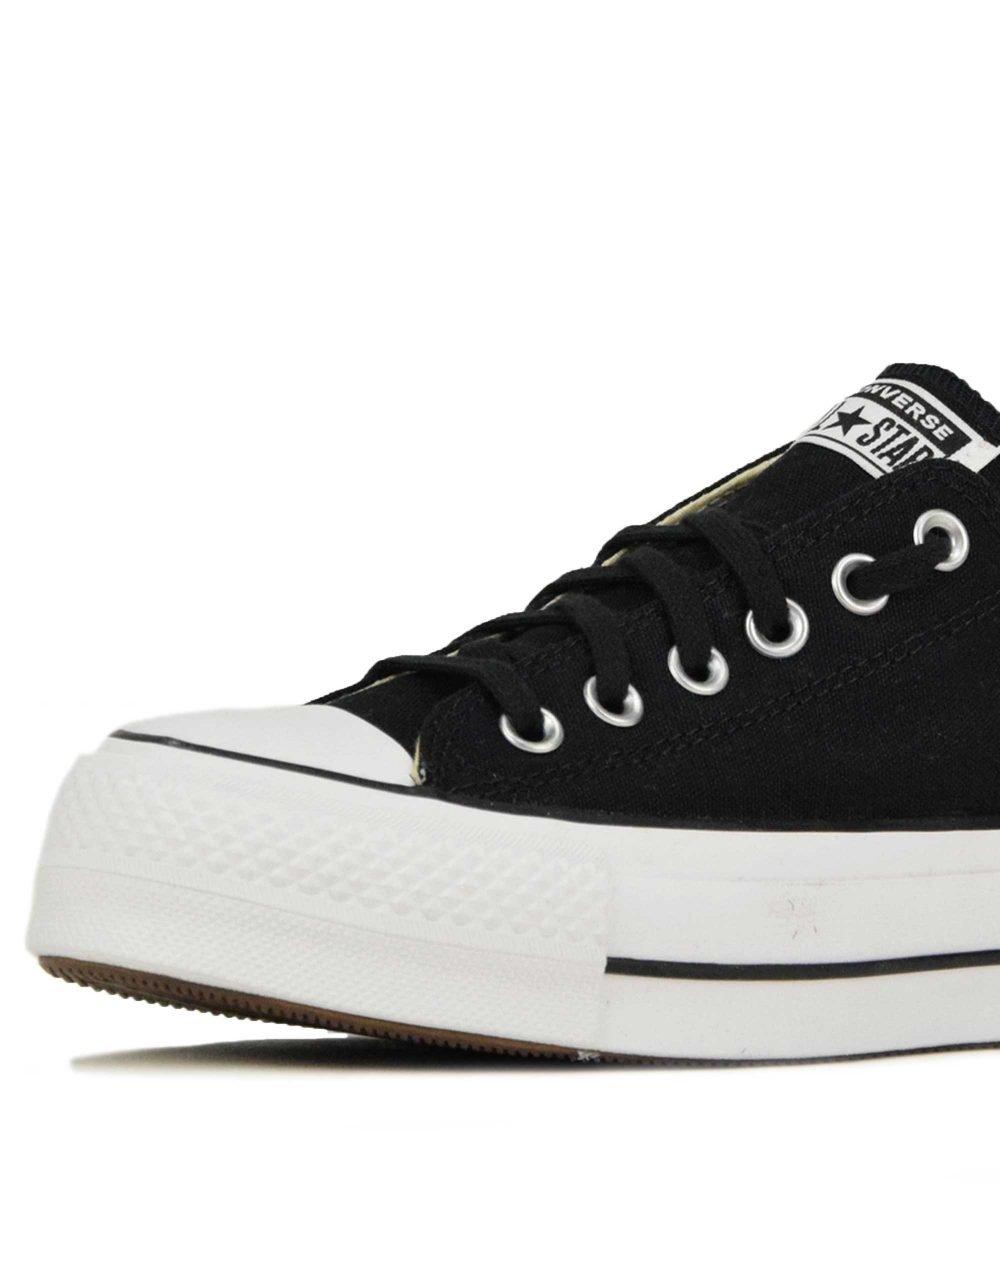 Converse Chuck Taylor All Star Lift Platform (560250) Black/White